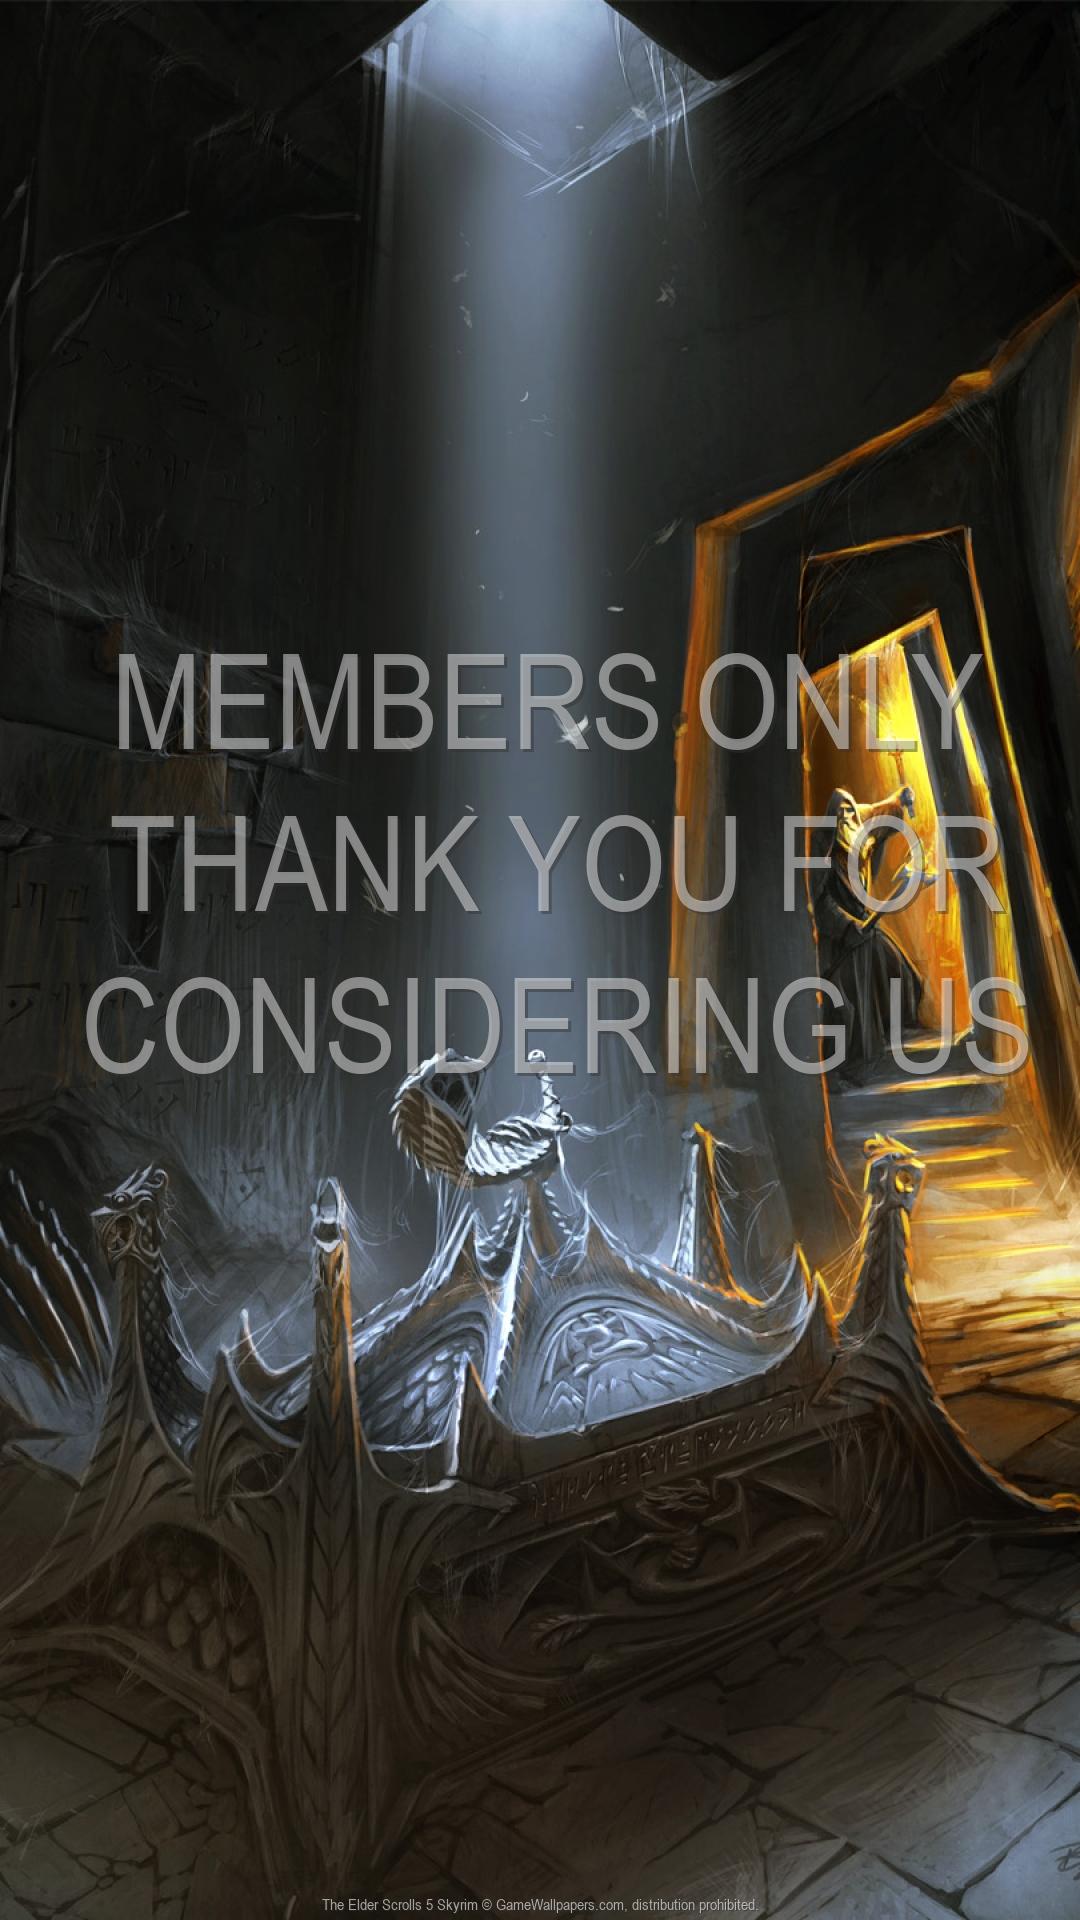 The Elder Scrolls 5: Skyrim 1920x1080 Handy Hintergrundbild 07